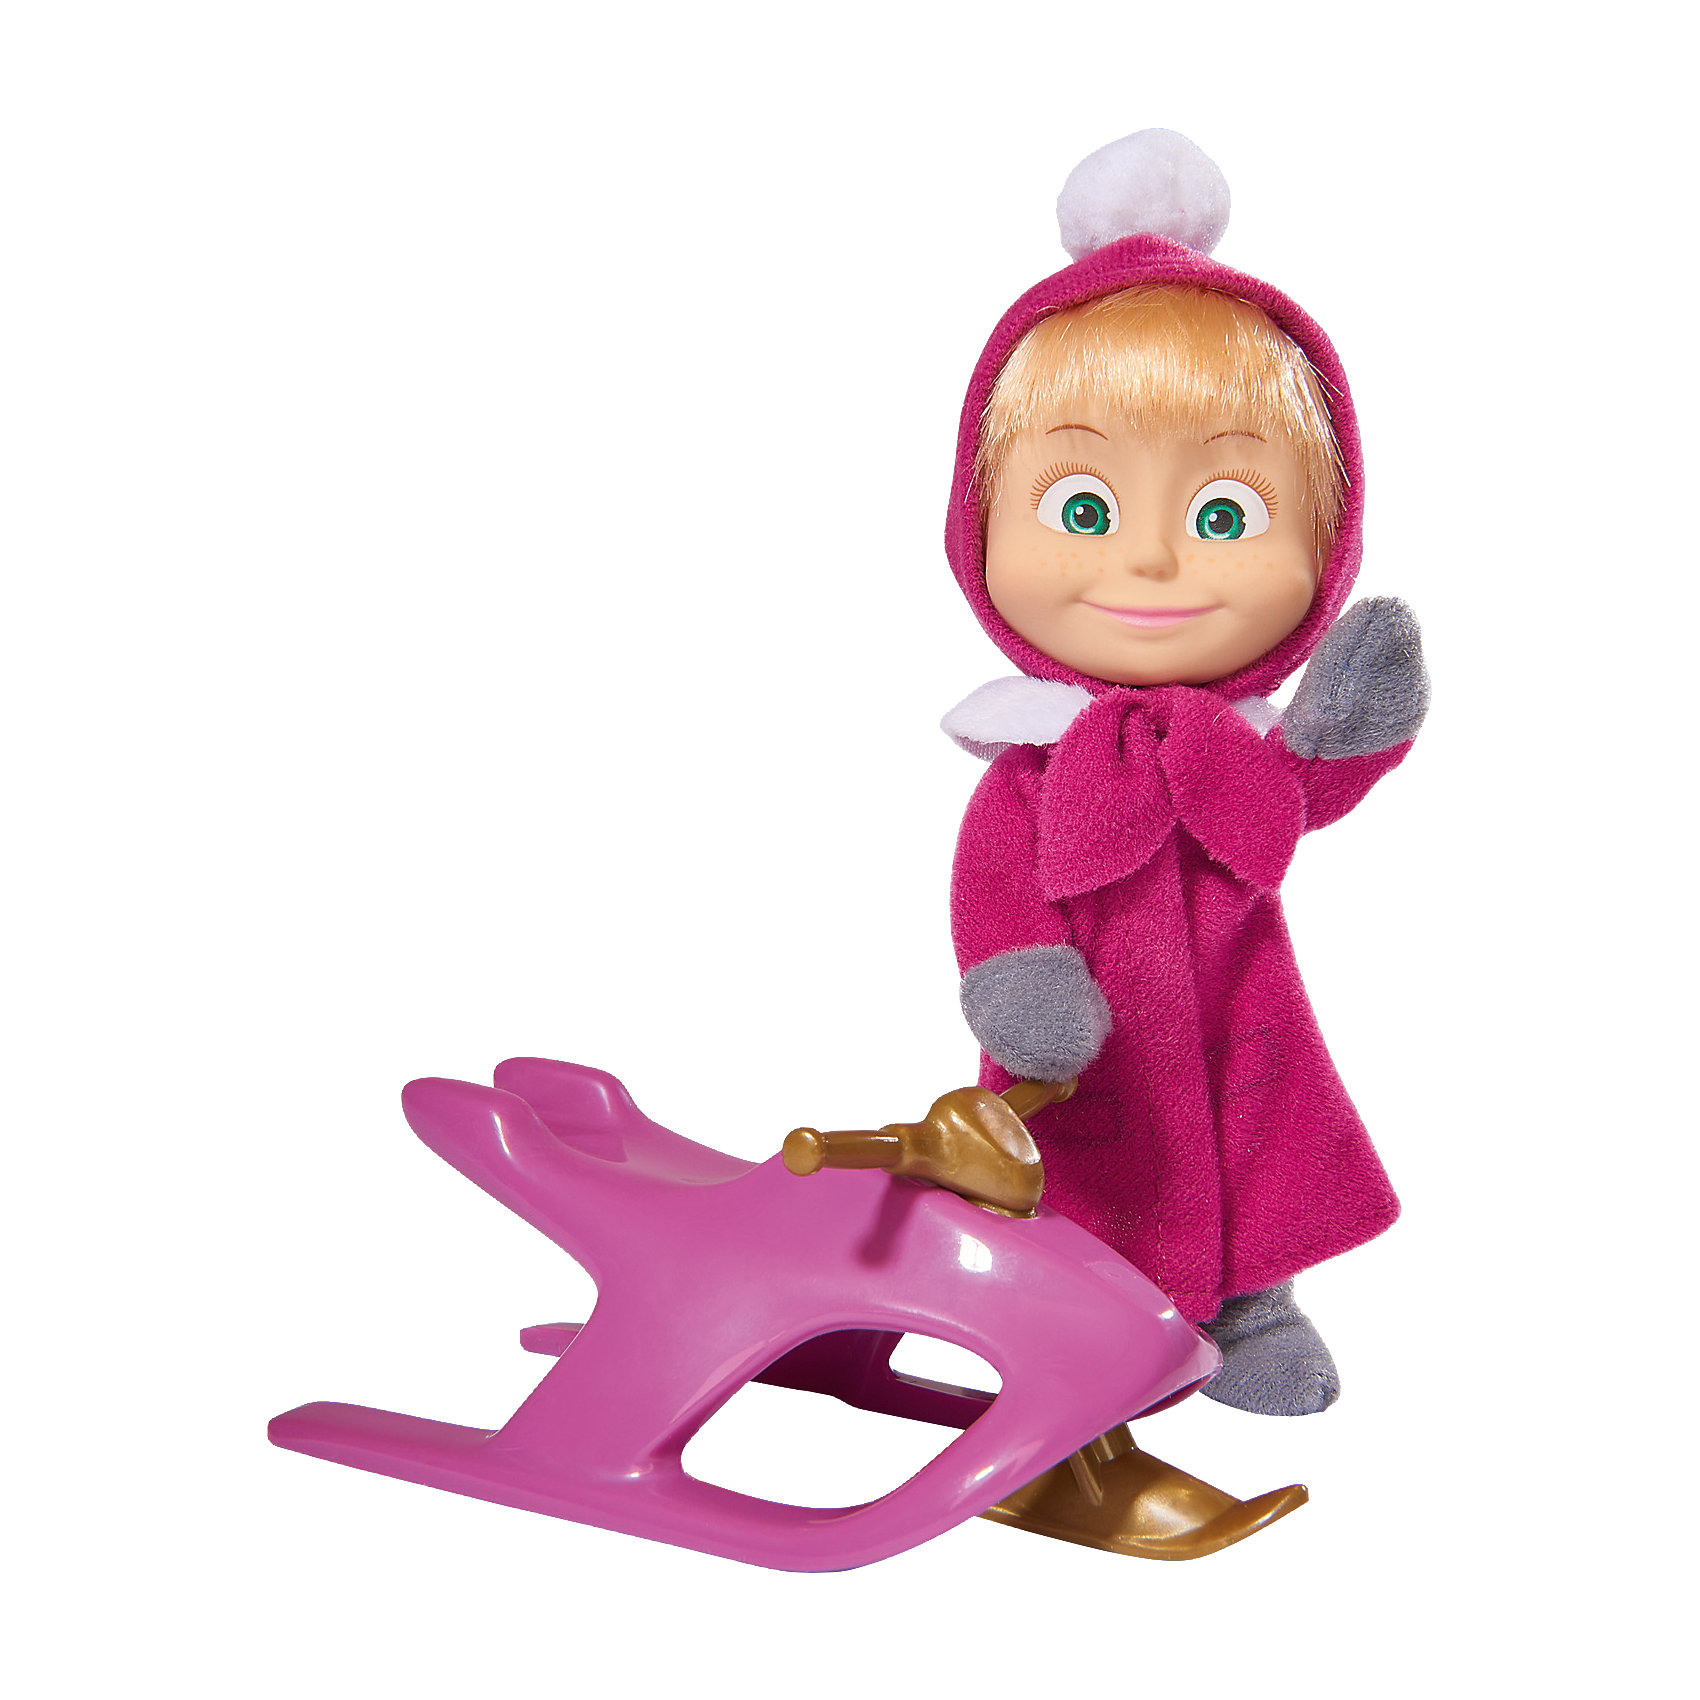 Simba Кукла Маша со снегокатом, Маша и Медведь, Simba simba игровой набор маша художница